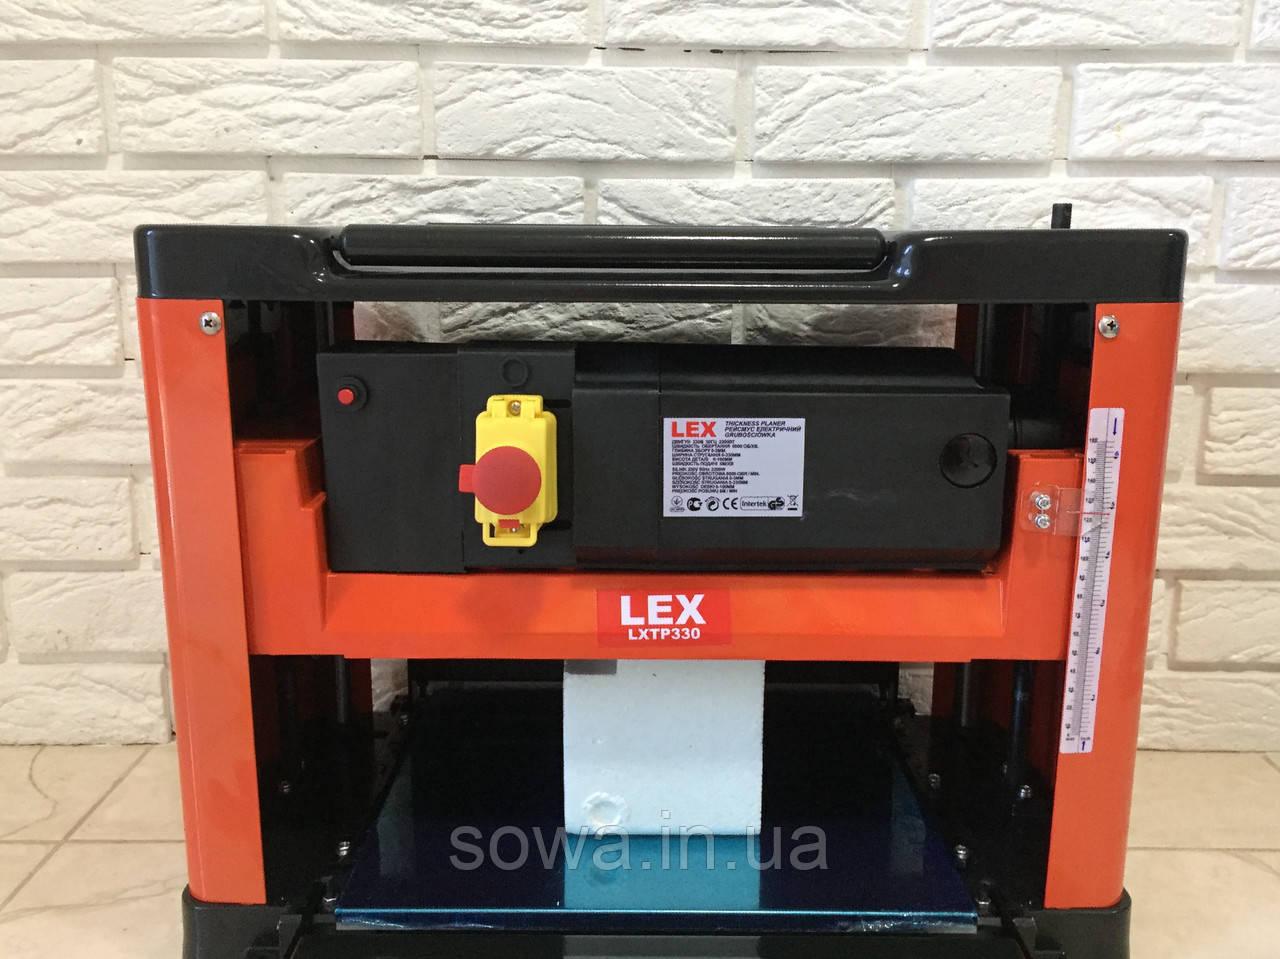 ✔️ Рейсмус електричний LEX LXTP330 ( 2200Вт )